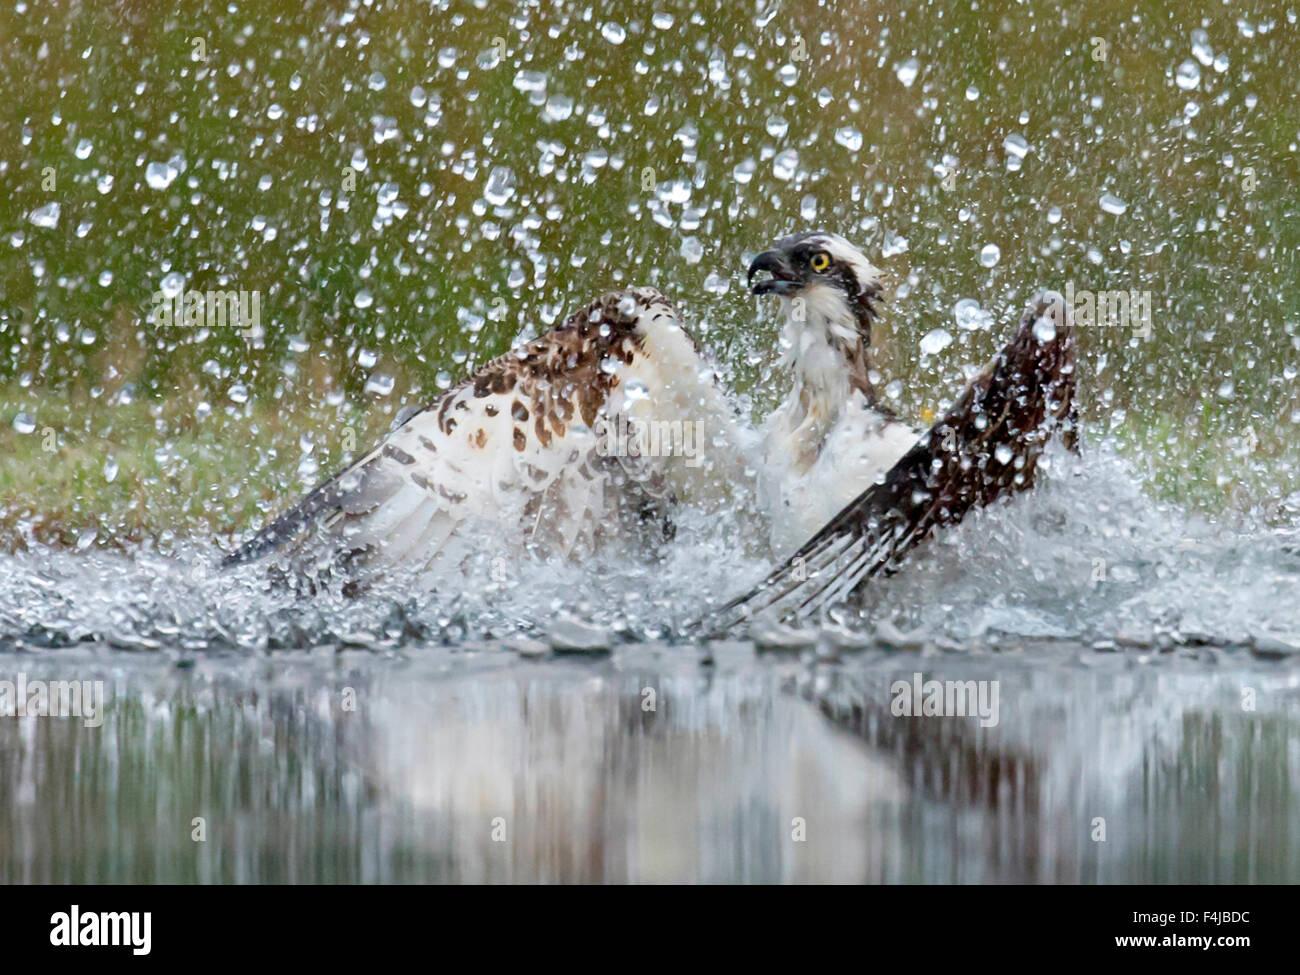 Osprey (Pandion haliaetus) splashing as it emerges from dive to catch fish, Scotland, UK, August. - Stock Image